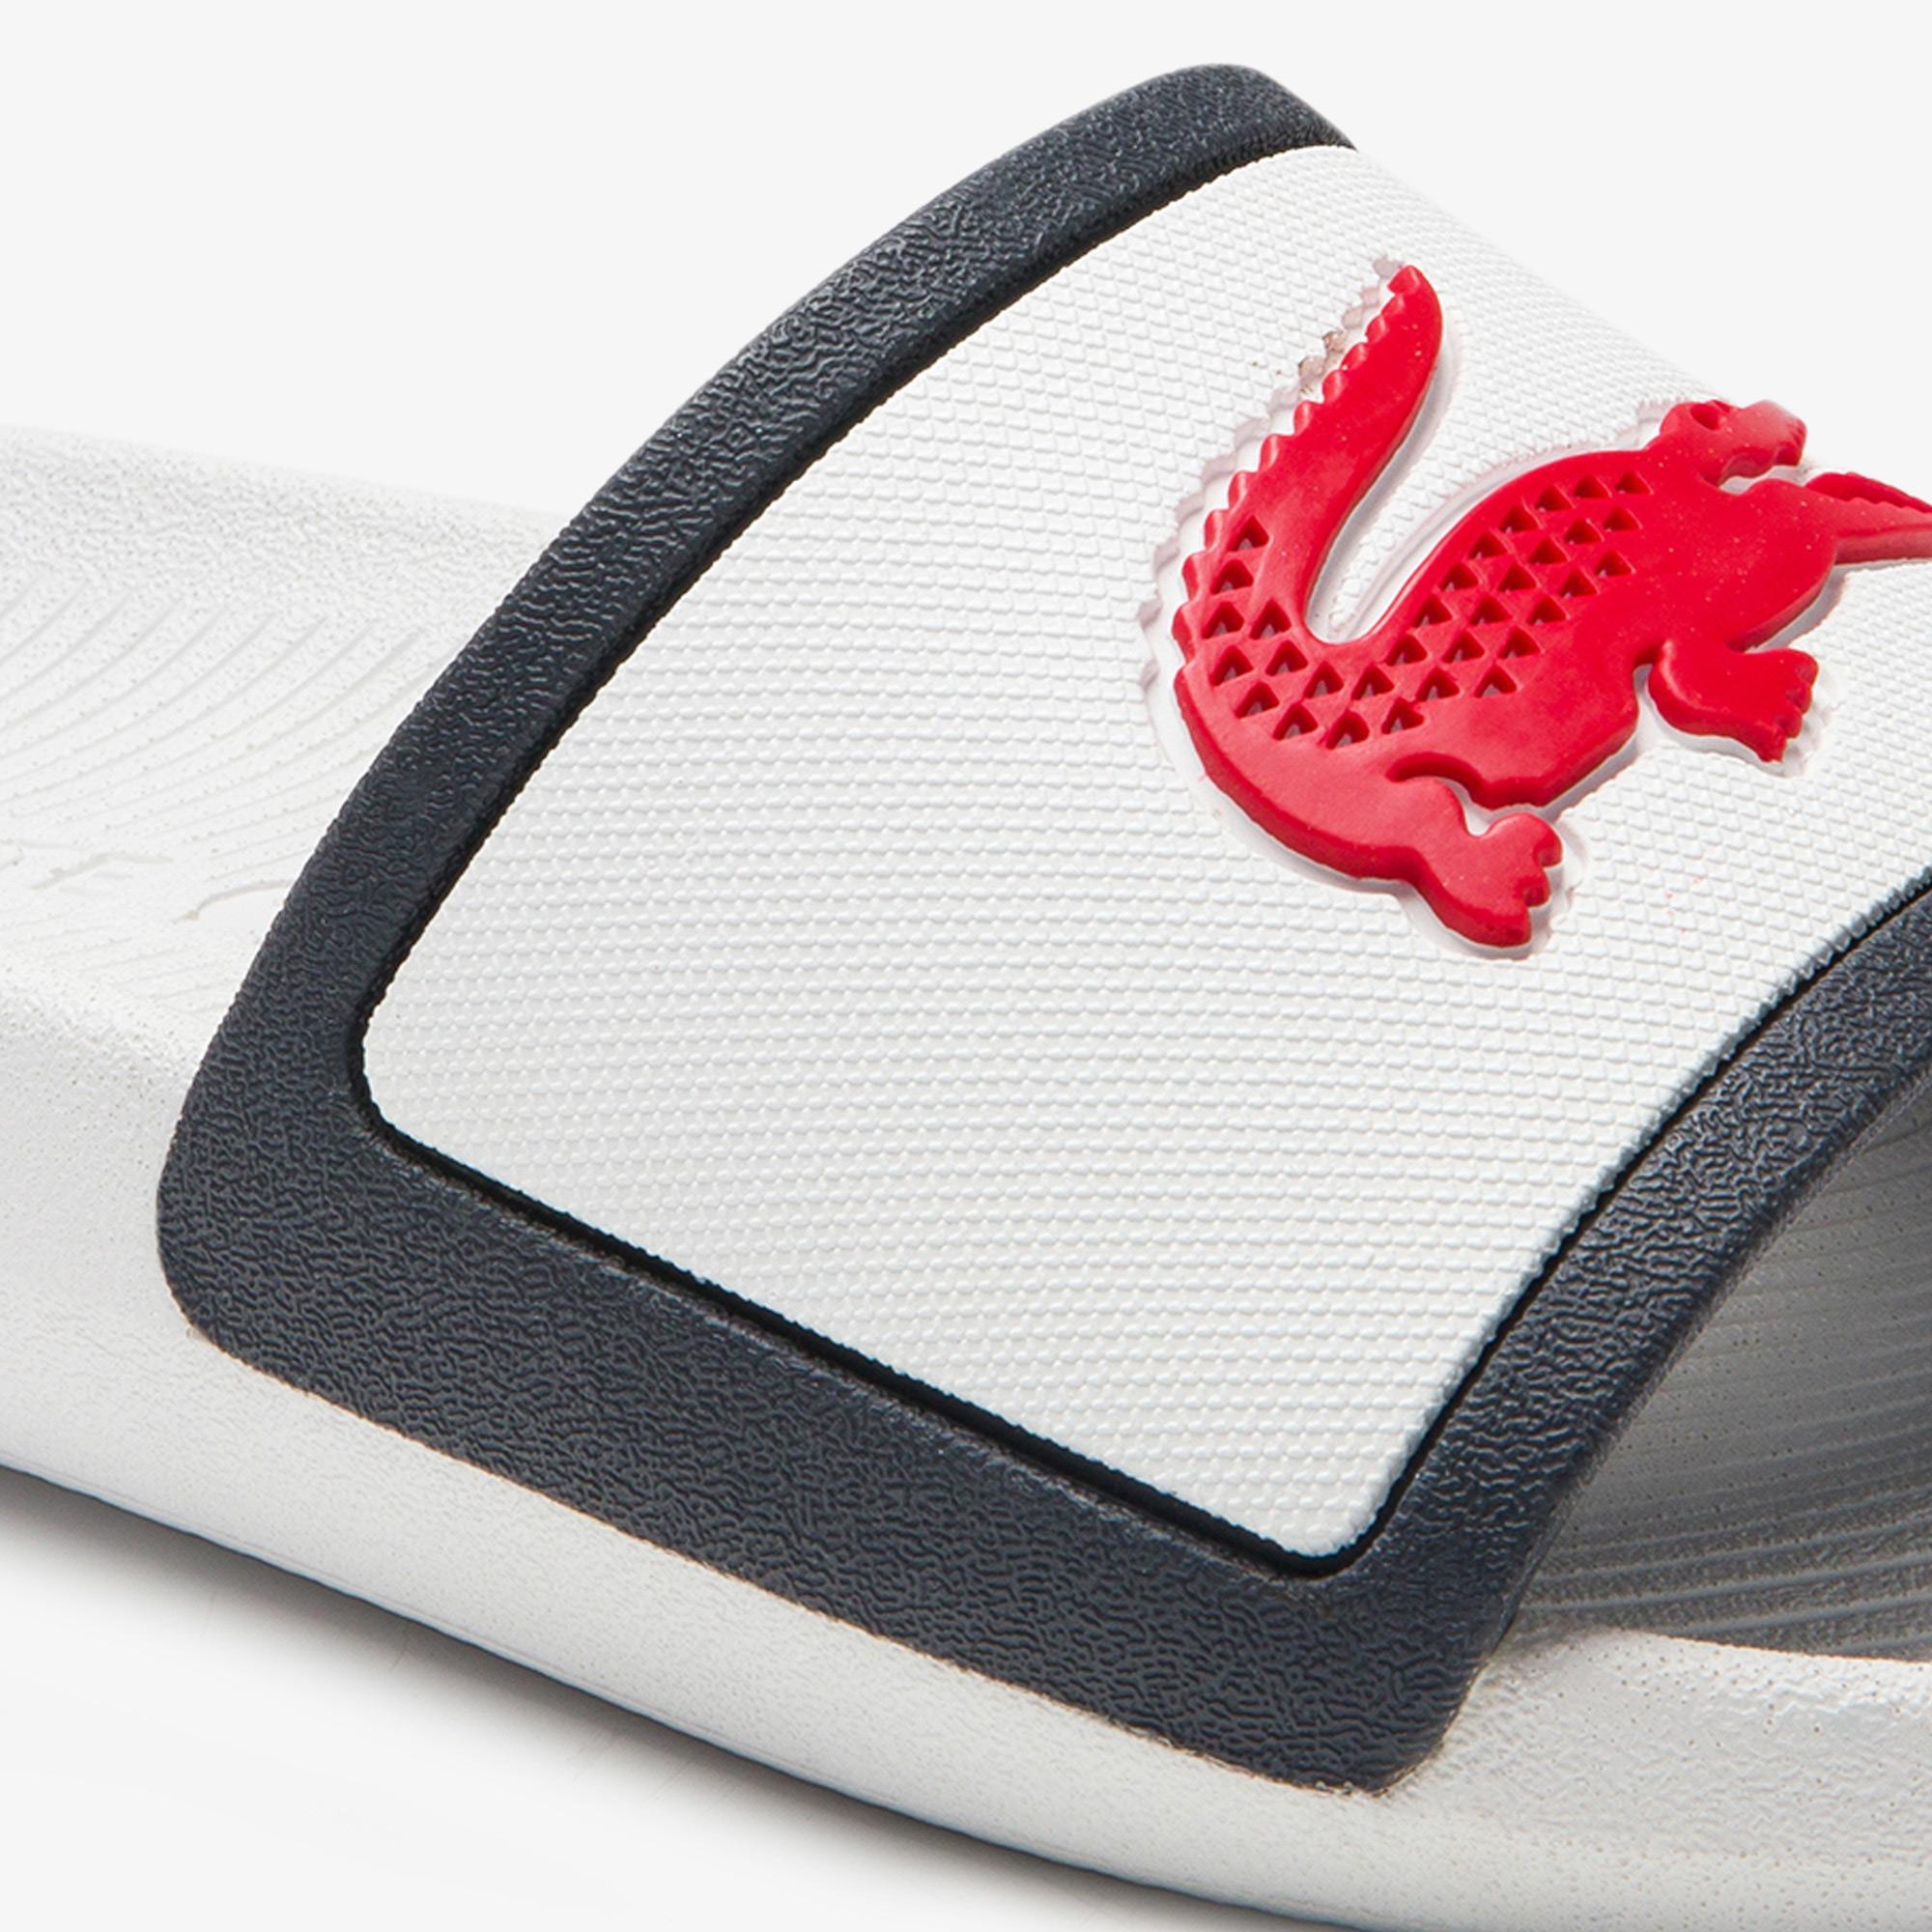 Lacoste Women's Croco Slıde Trı 3 Cfa Shoes